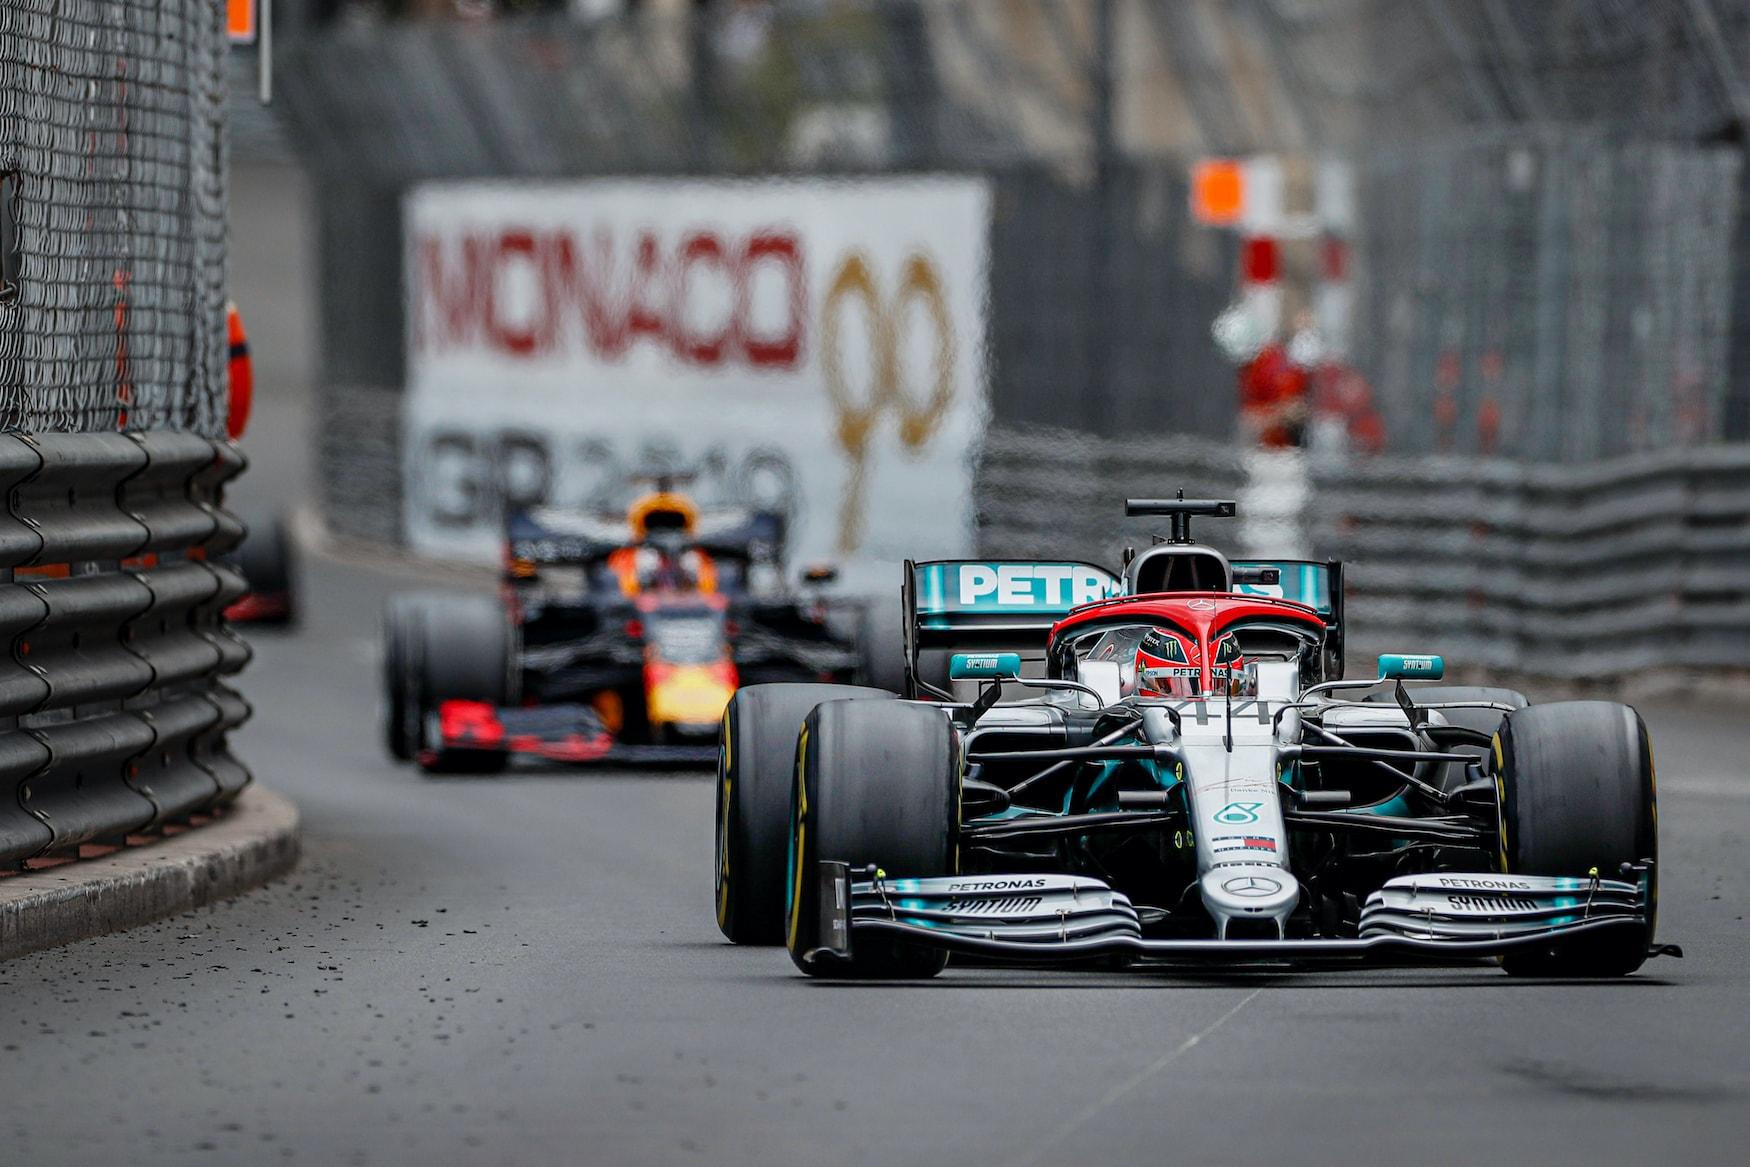 Formula 1 Grand Prix de Monaco 2019